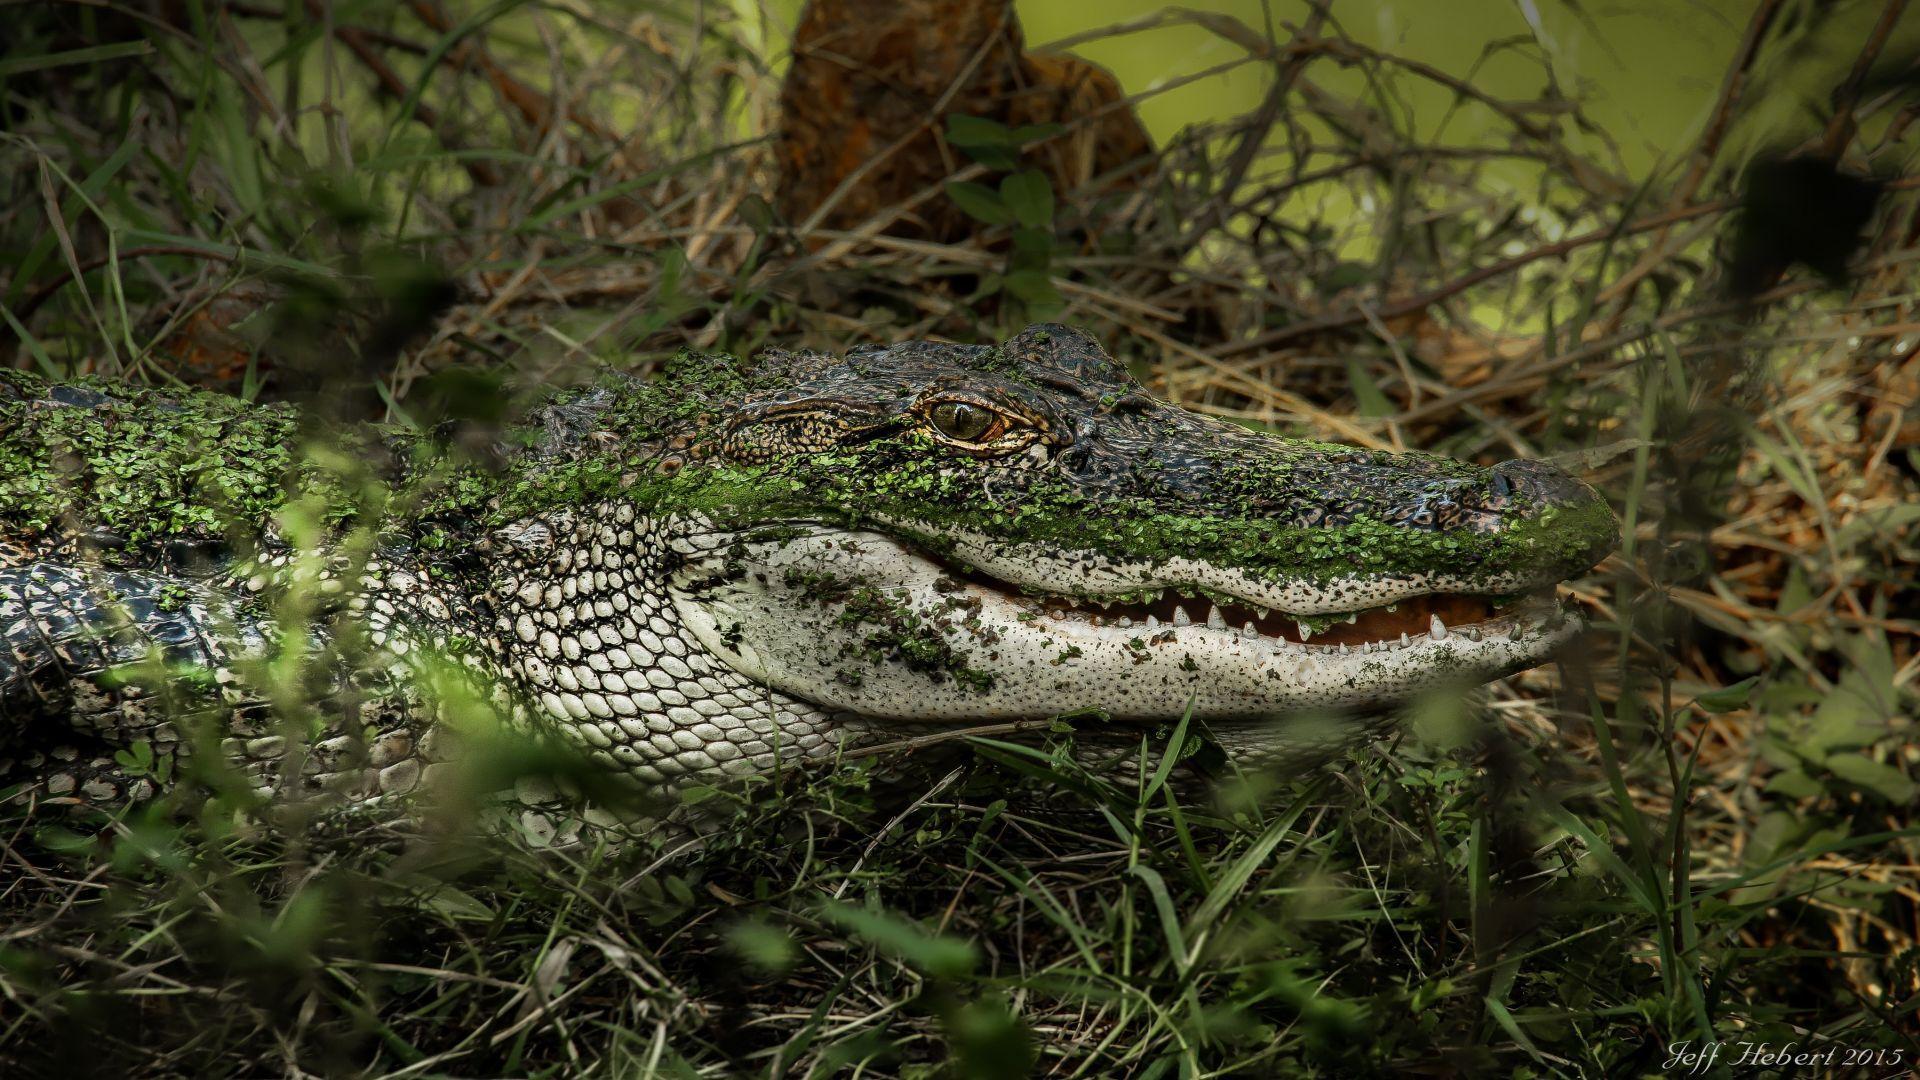 Crocodile wallpaper photo full hd